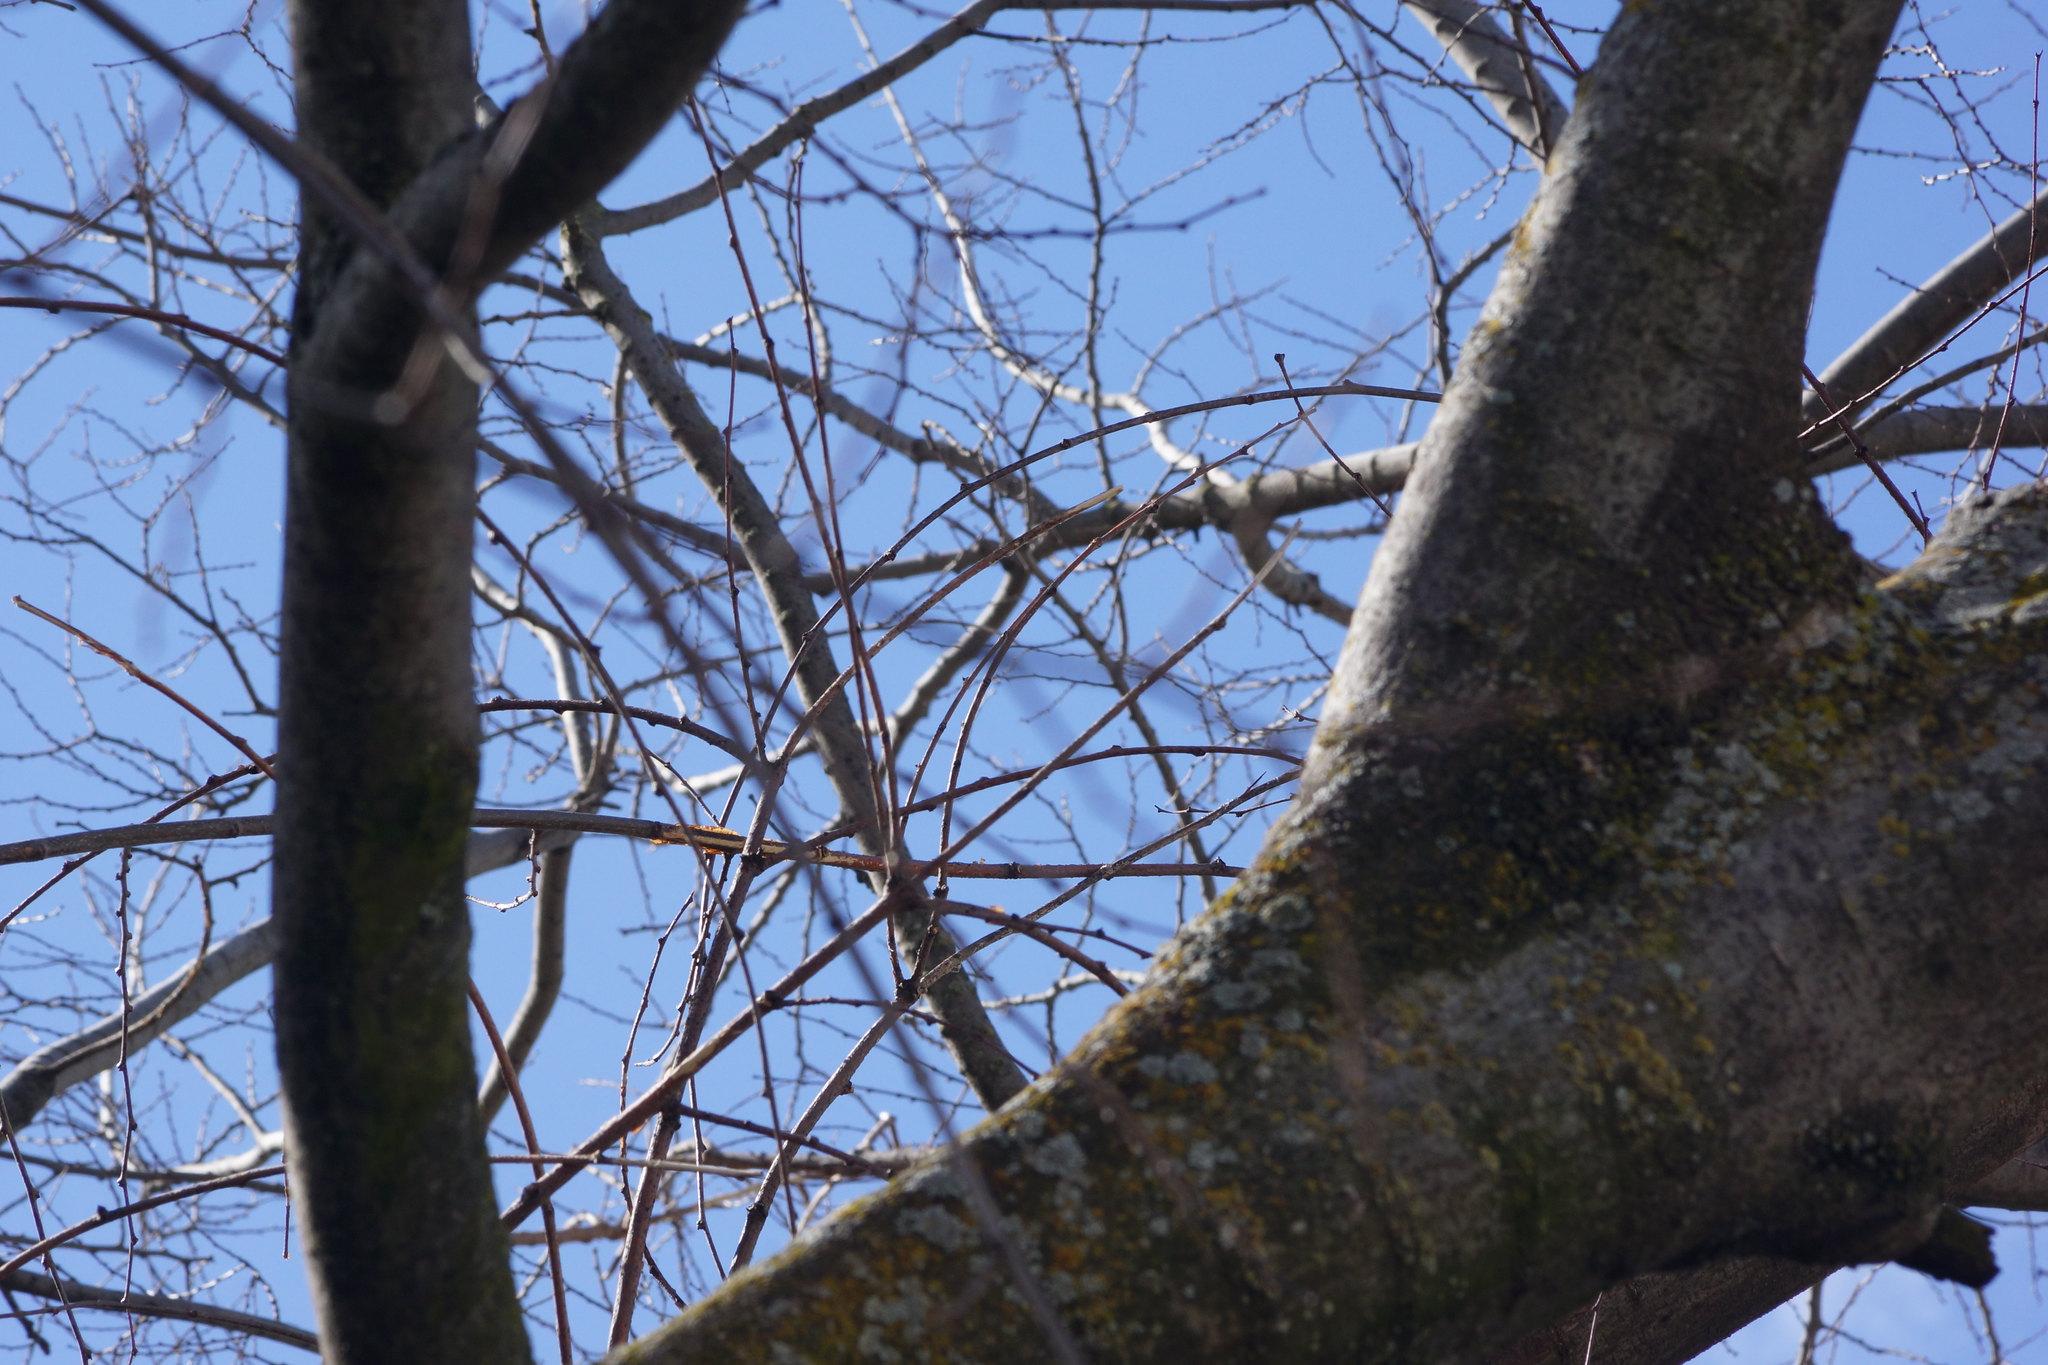 2017-02-16 Twigs Test - Take 5 [#4]